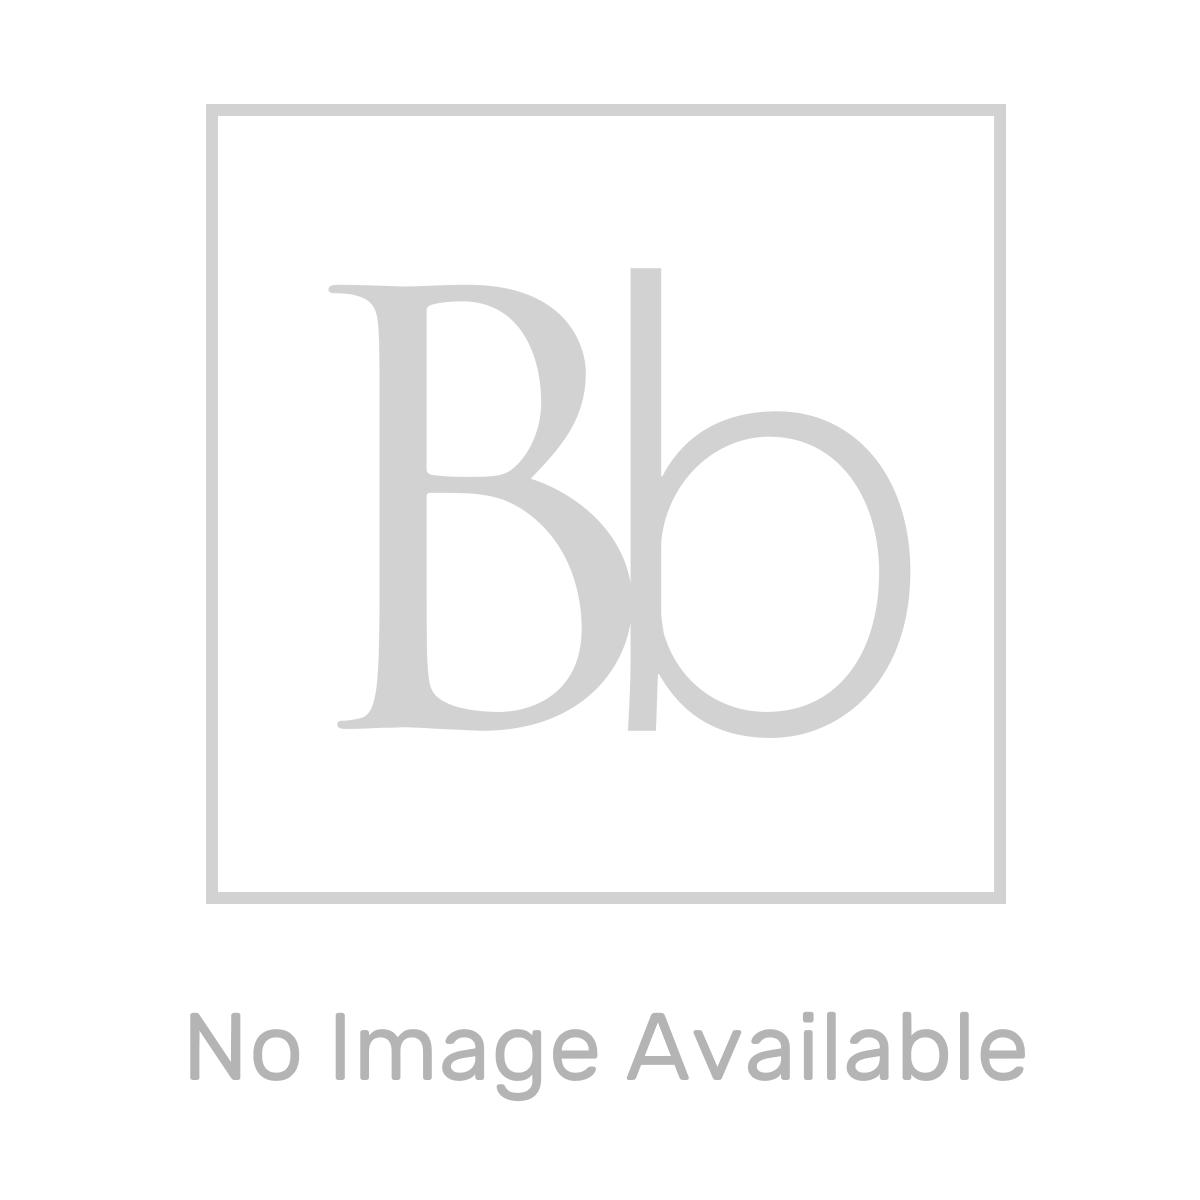 Lakes Classic White Bifold Door Shower Door with Optional Side Panel